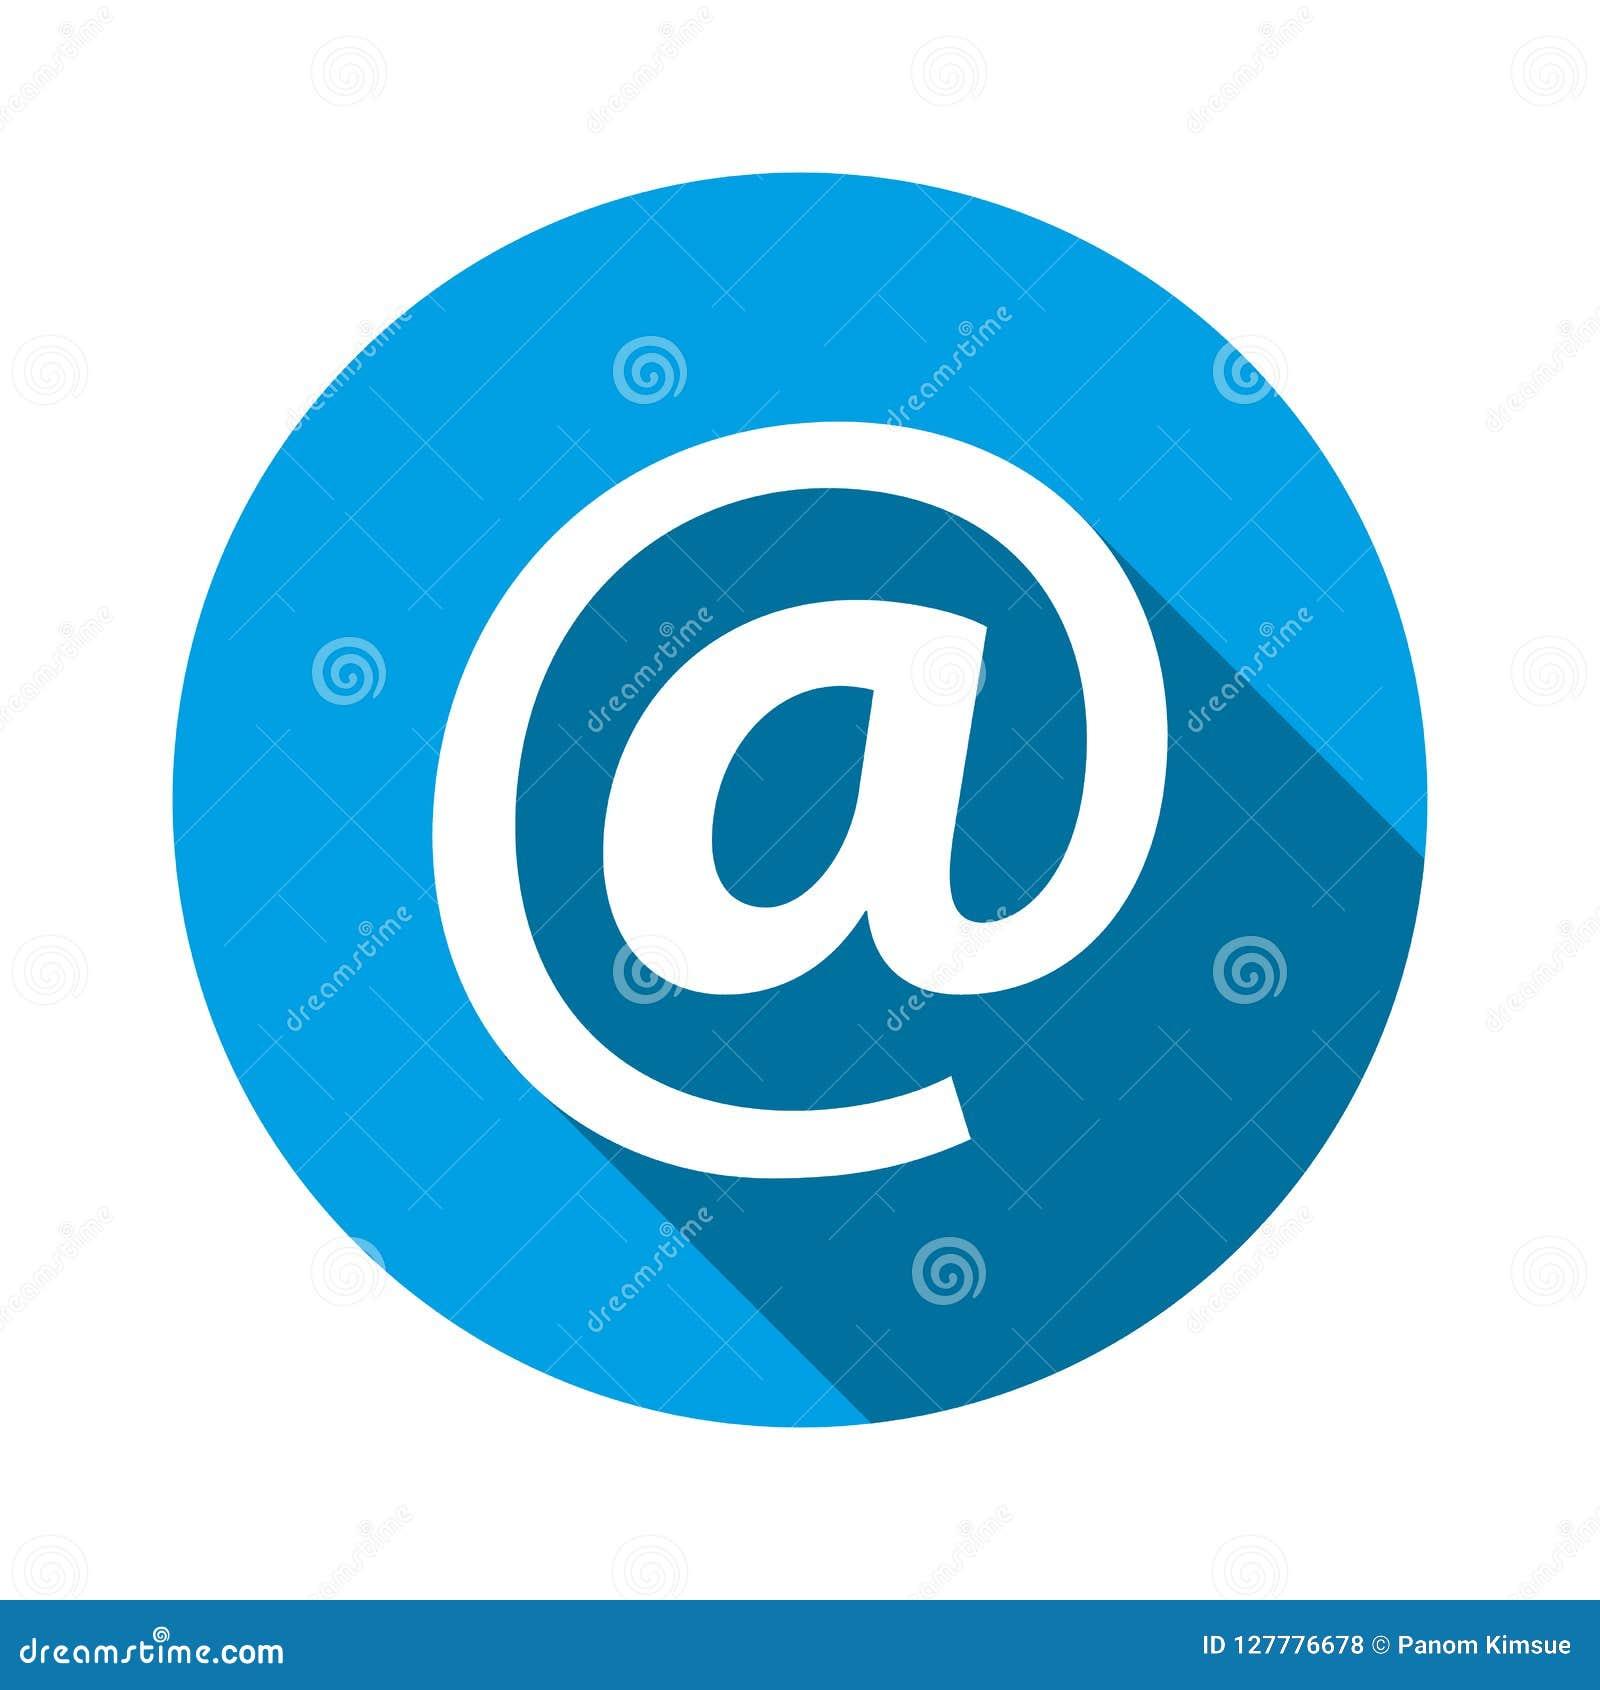 Email address icon. Vector illustration. At sign symbol for graphic design, logo, web site, social media, mobile app, ui illustrat